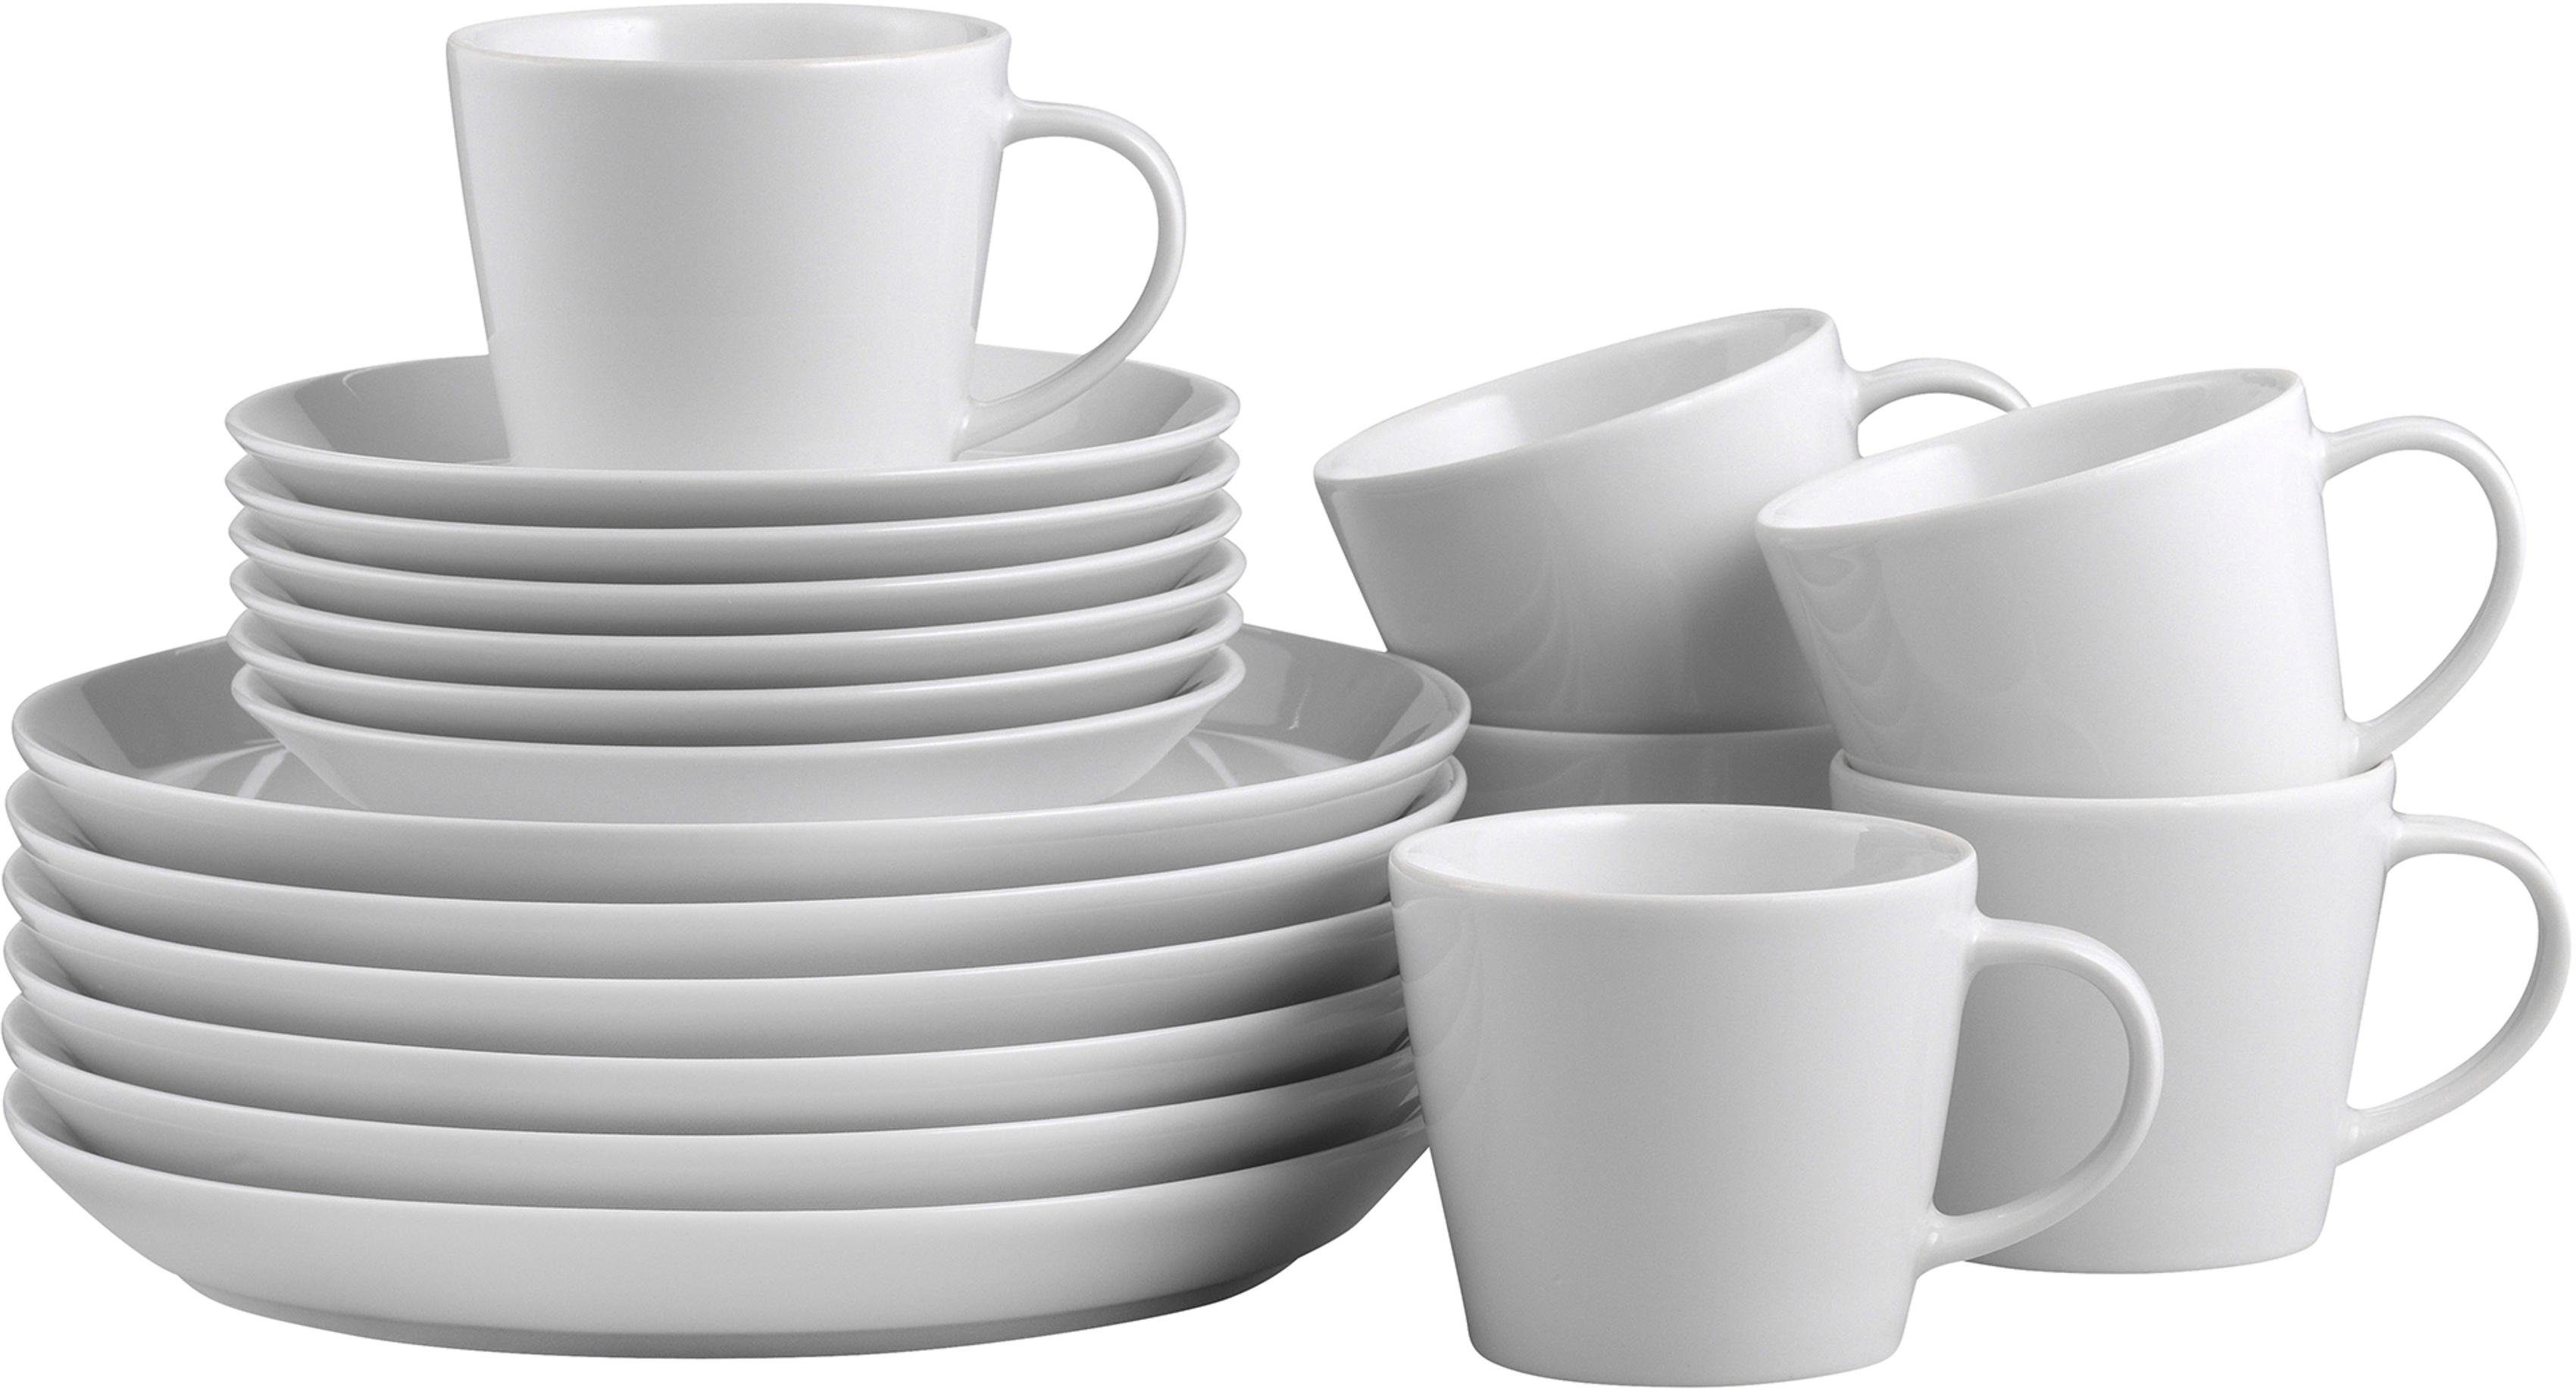 CreaTable Kaffeeservice, Porzellan, 18 Teile, »TRENDY«